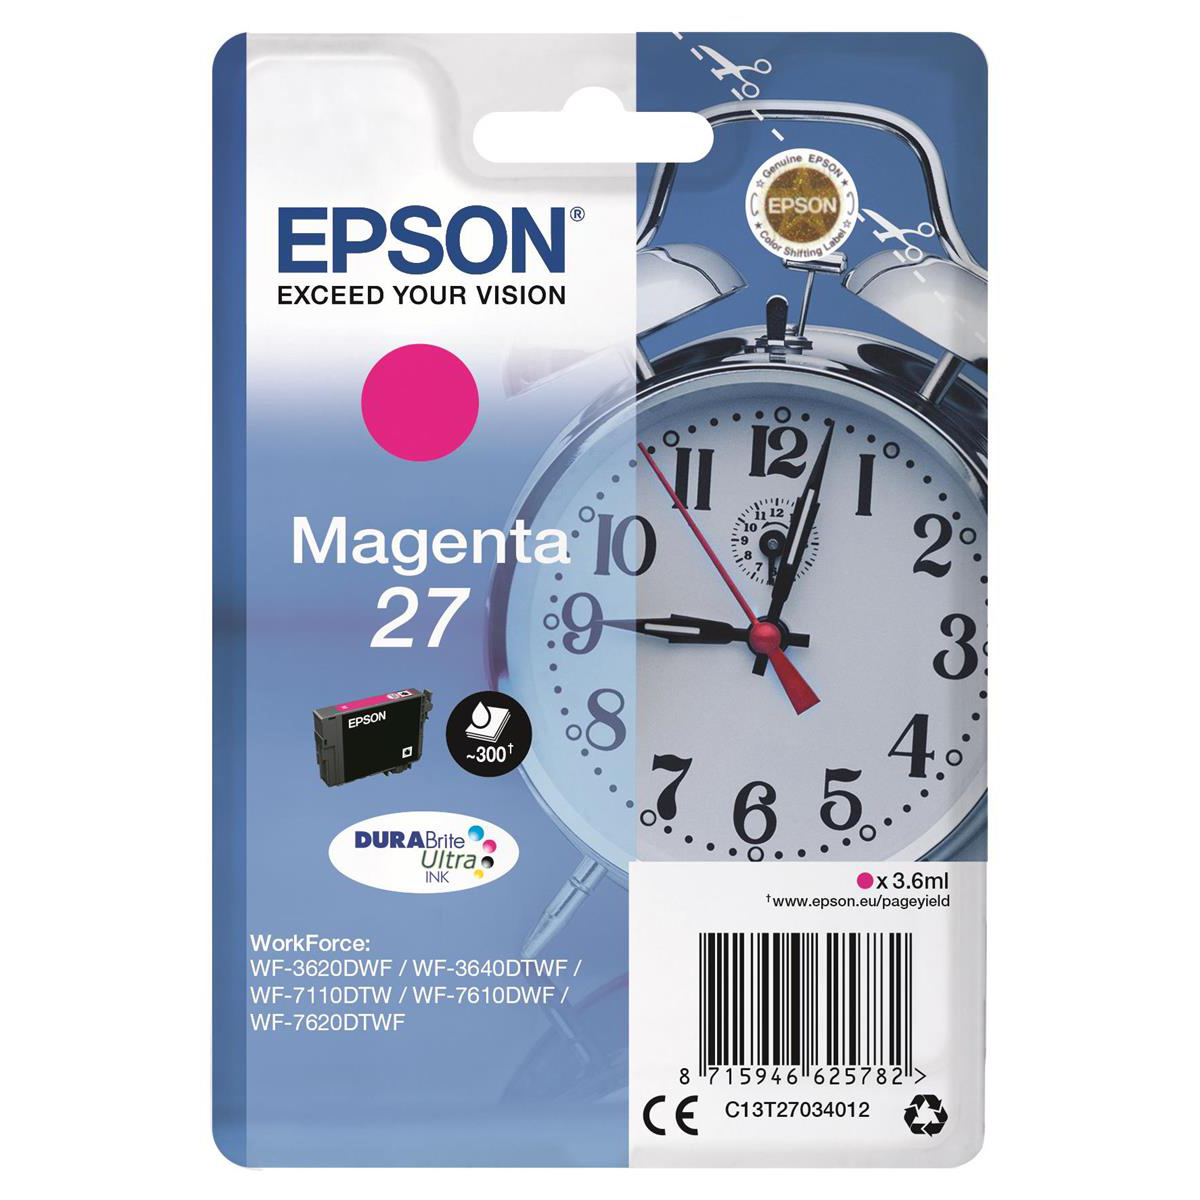 Inkjet Cartridges Epson 27 Inkjet Cartridge Alarm Clock Page Life 300pp 3.6ml Magenta Ref C13T27034012